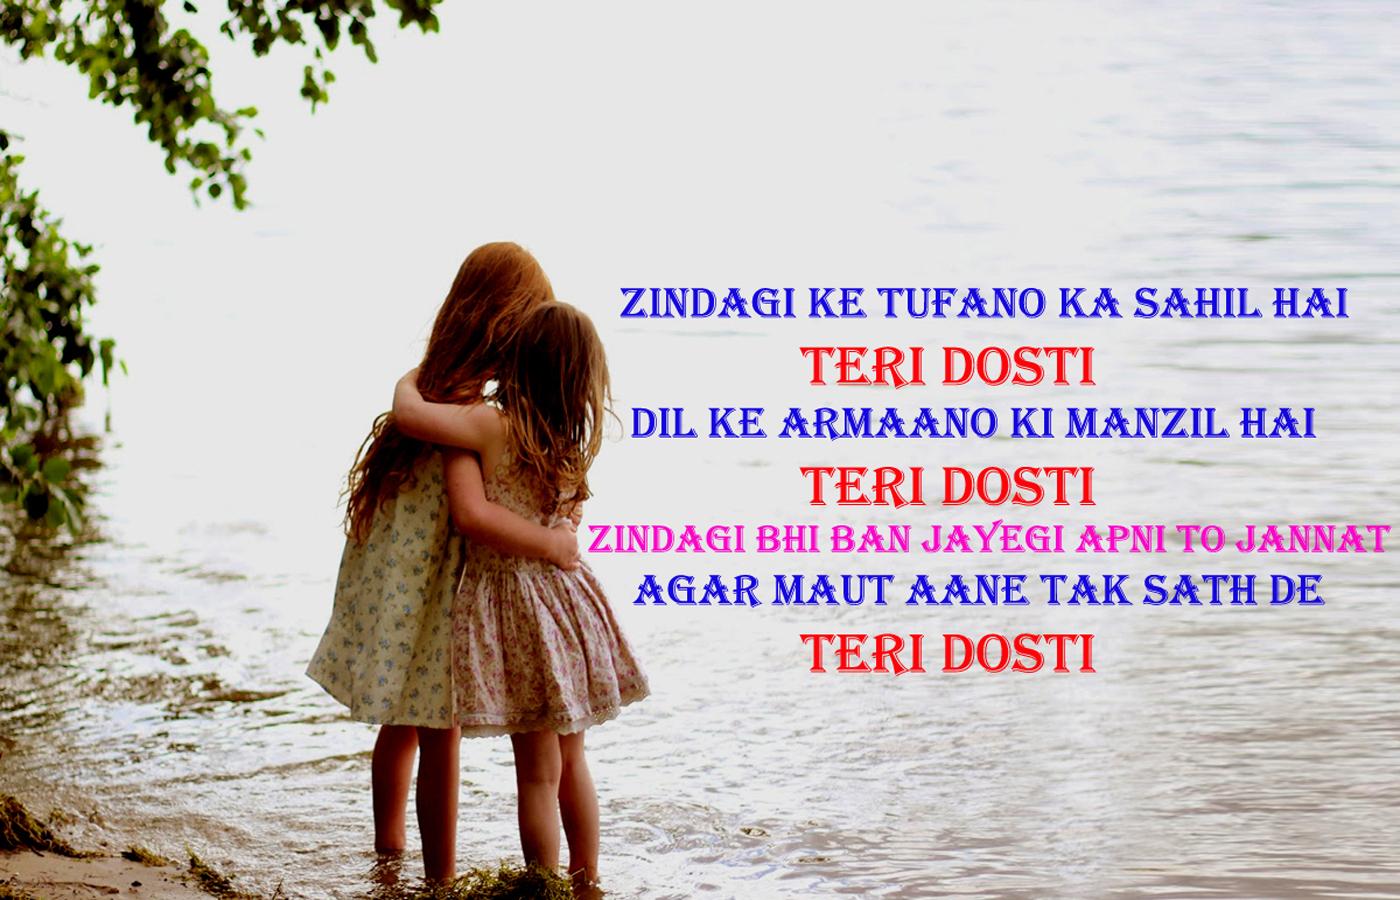 Friendship And Love Shayari Images | Picshayari